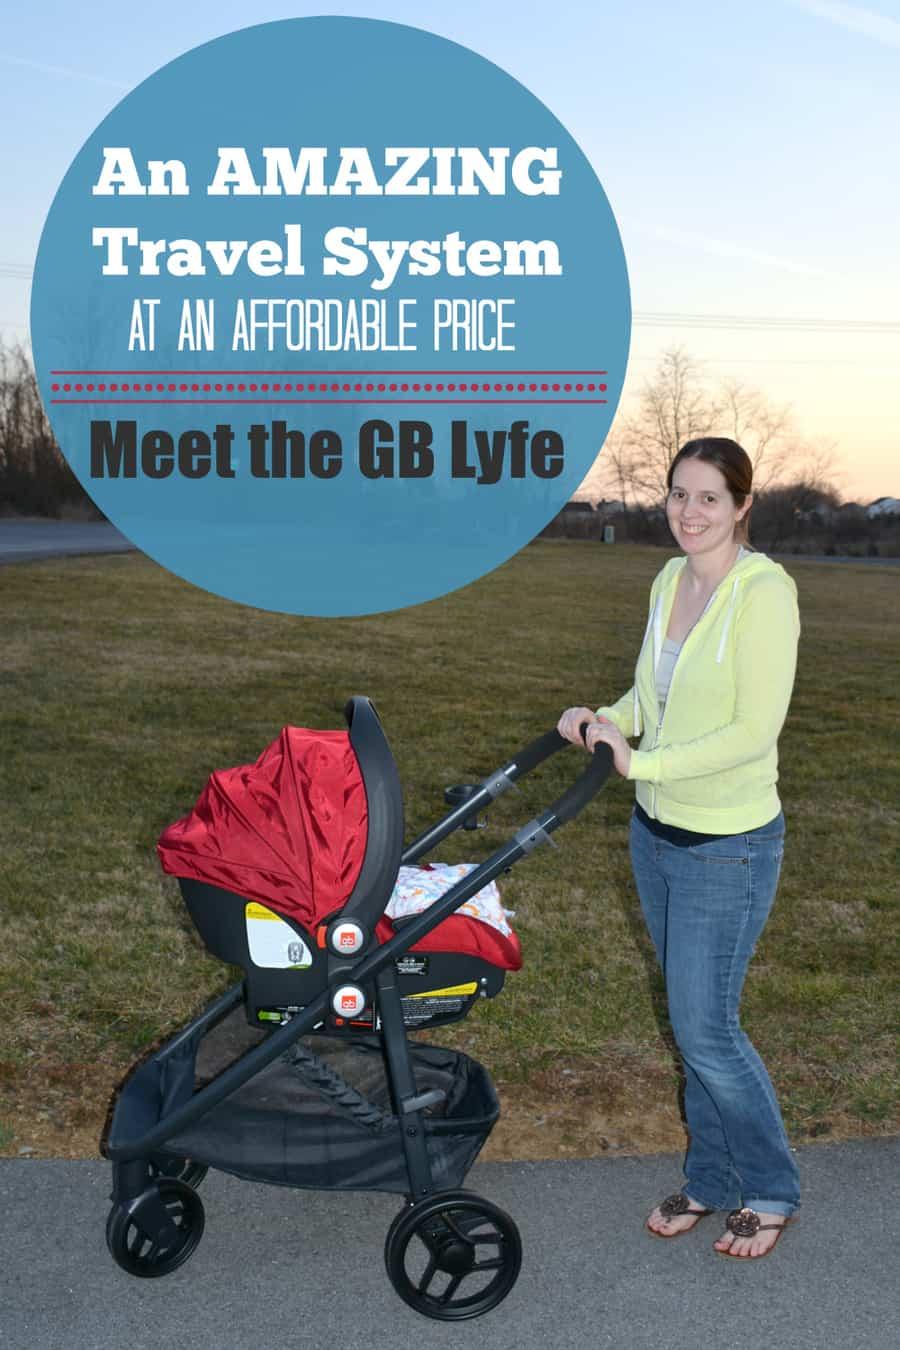 Meet the GB Lyfe Travel System